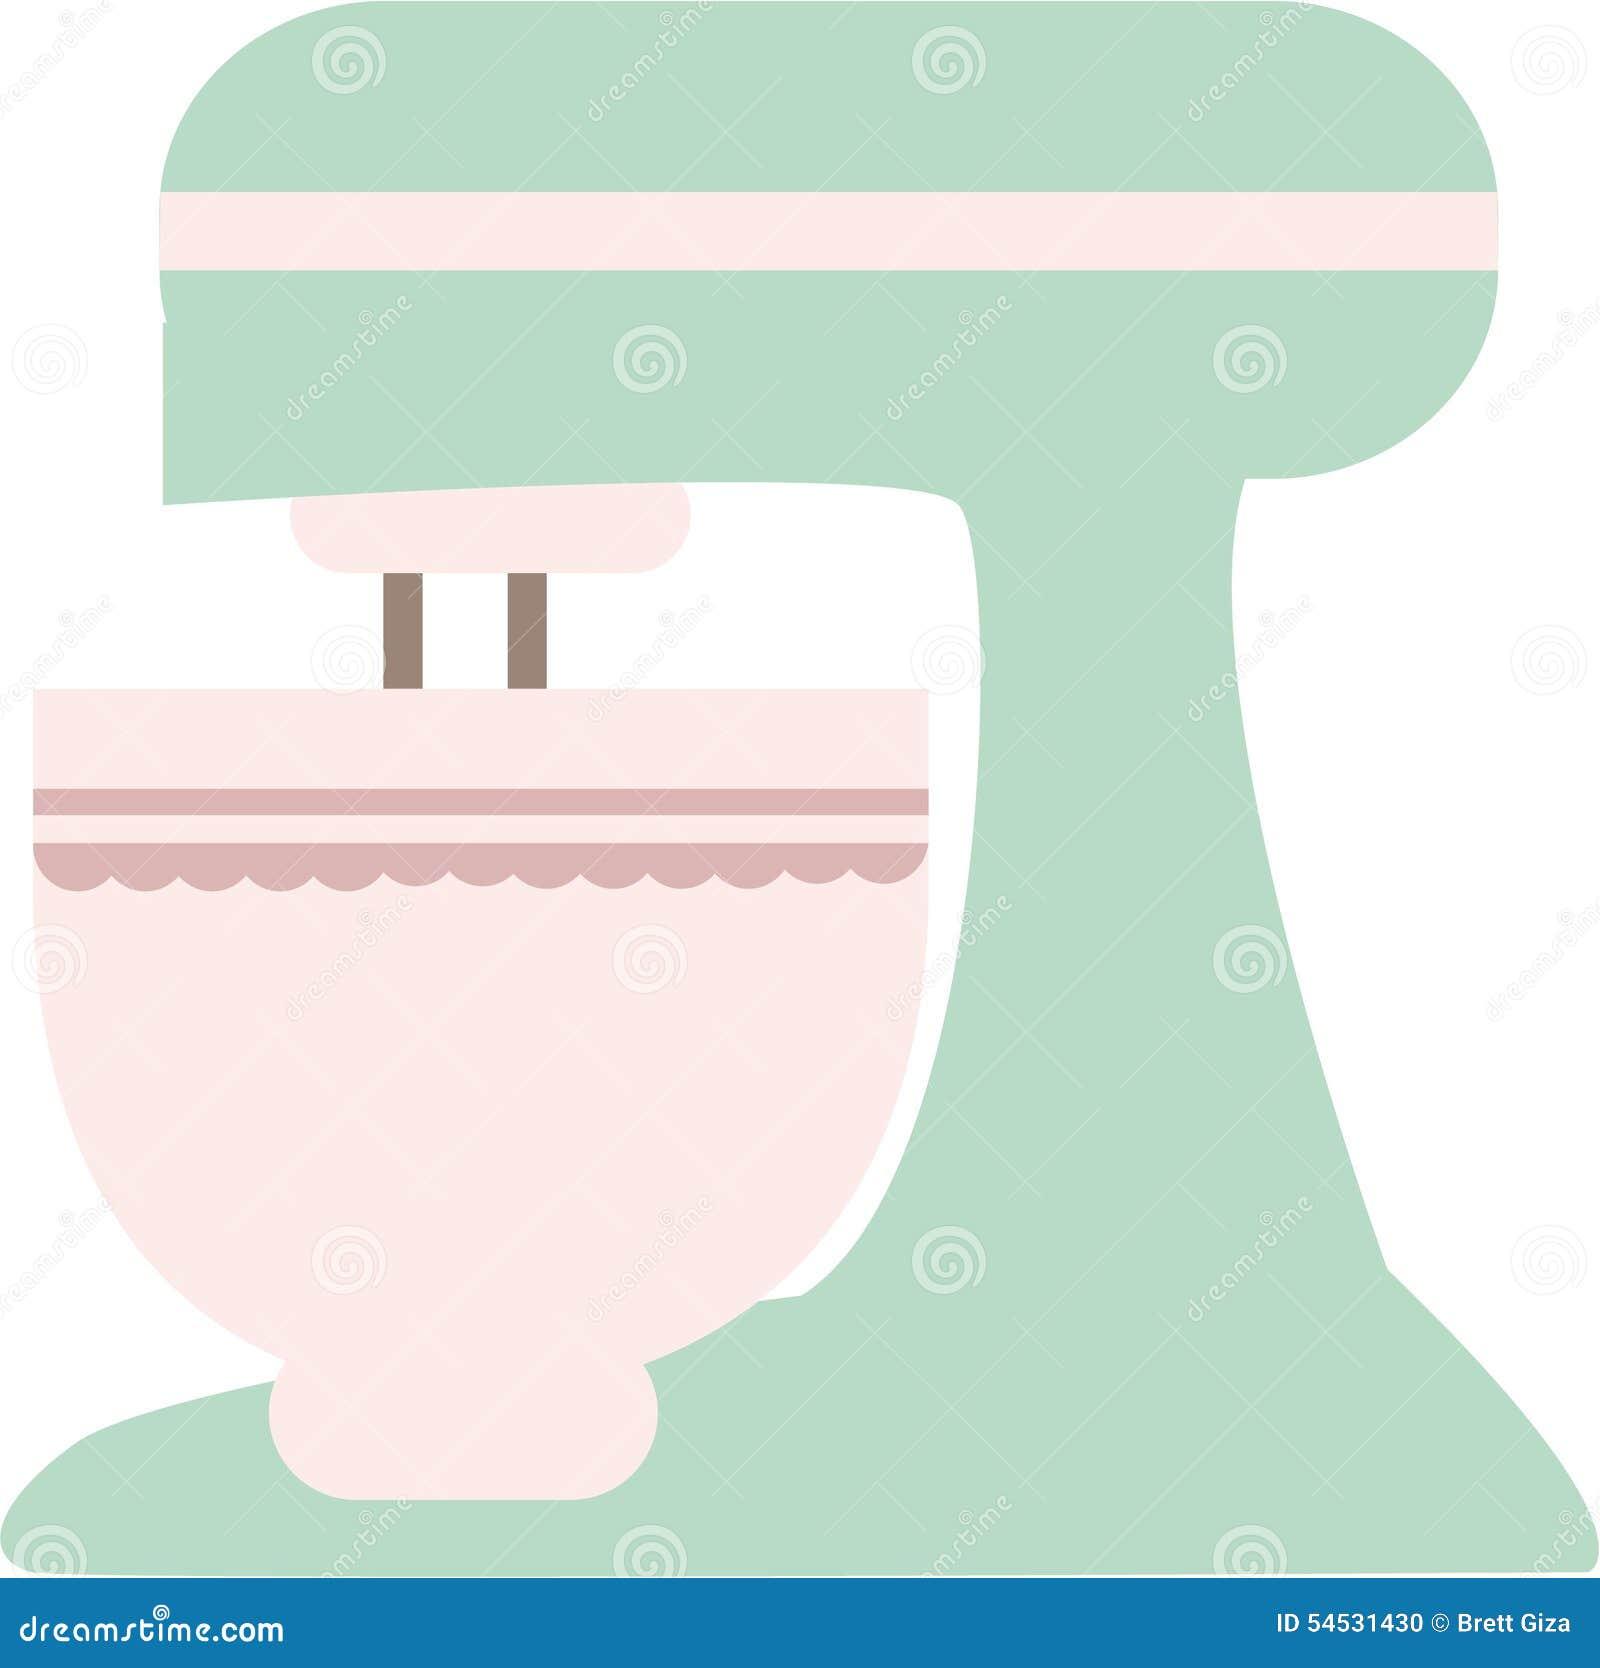 Kitchen Aid Immersion Blender Kitchenaid Mixer Stock Illustration - Image: 54531430